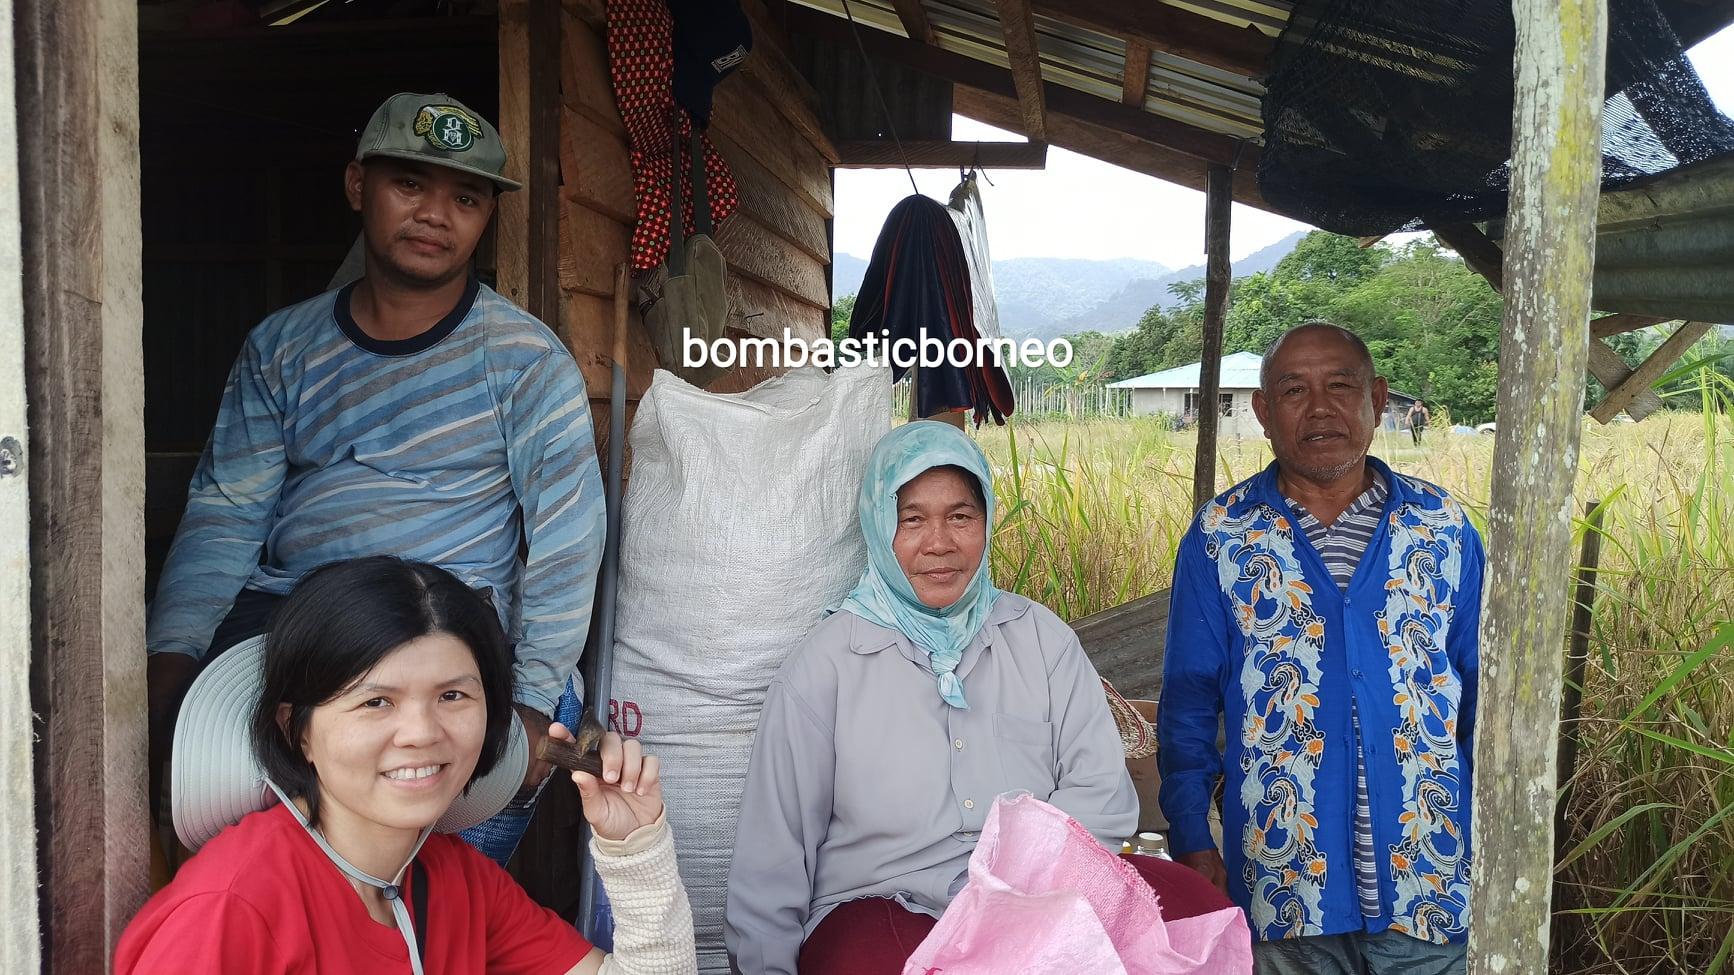 Kampung Bunan Gega, Paddy Farming, Paddy field, Paddy harvesting, Sawah Padi, authentic, traditional, Malaysia, tourism, travel guide, Trans Borneo, 马来西亚砂拉越, 西连比达友农民